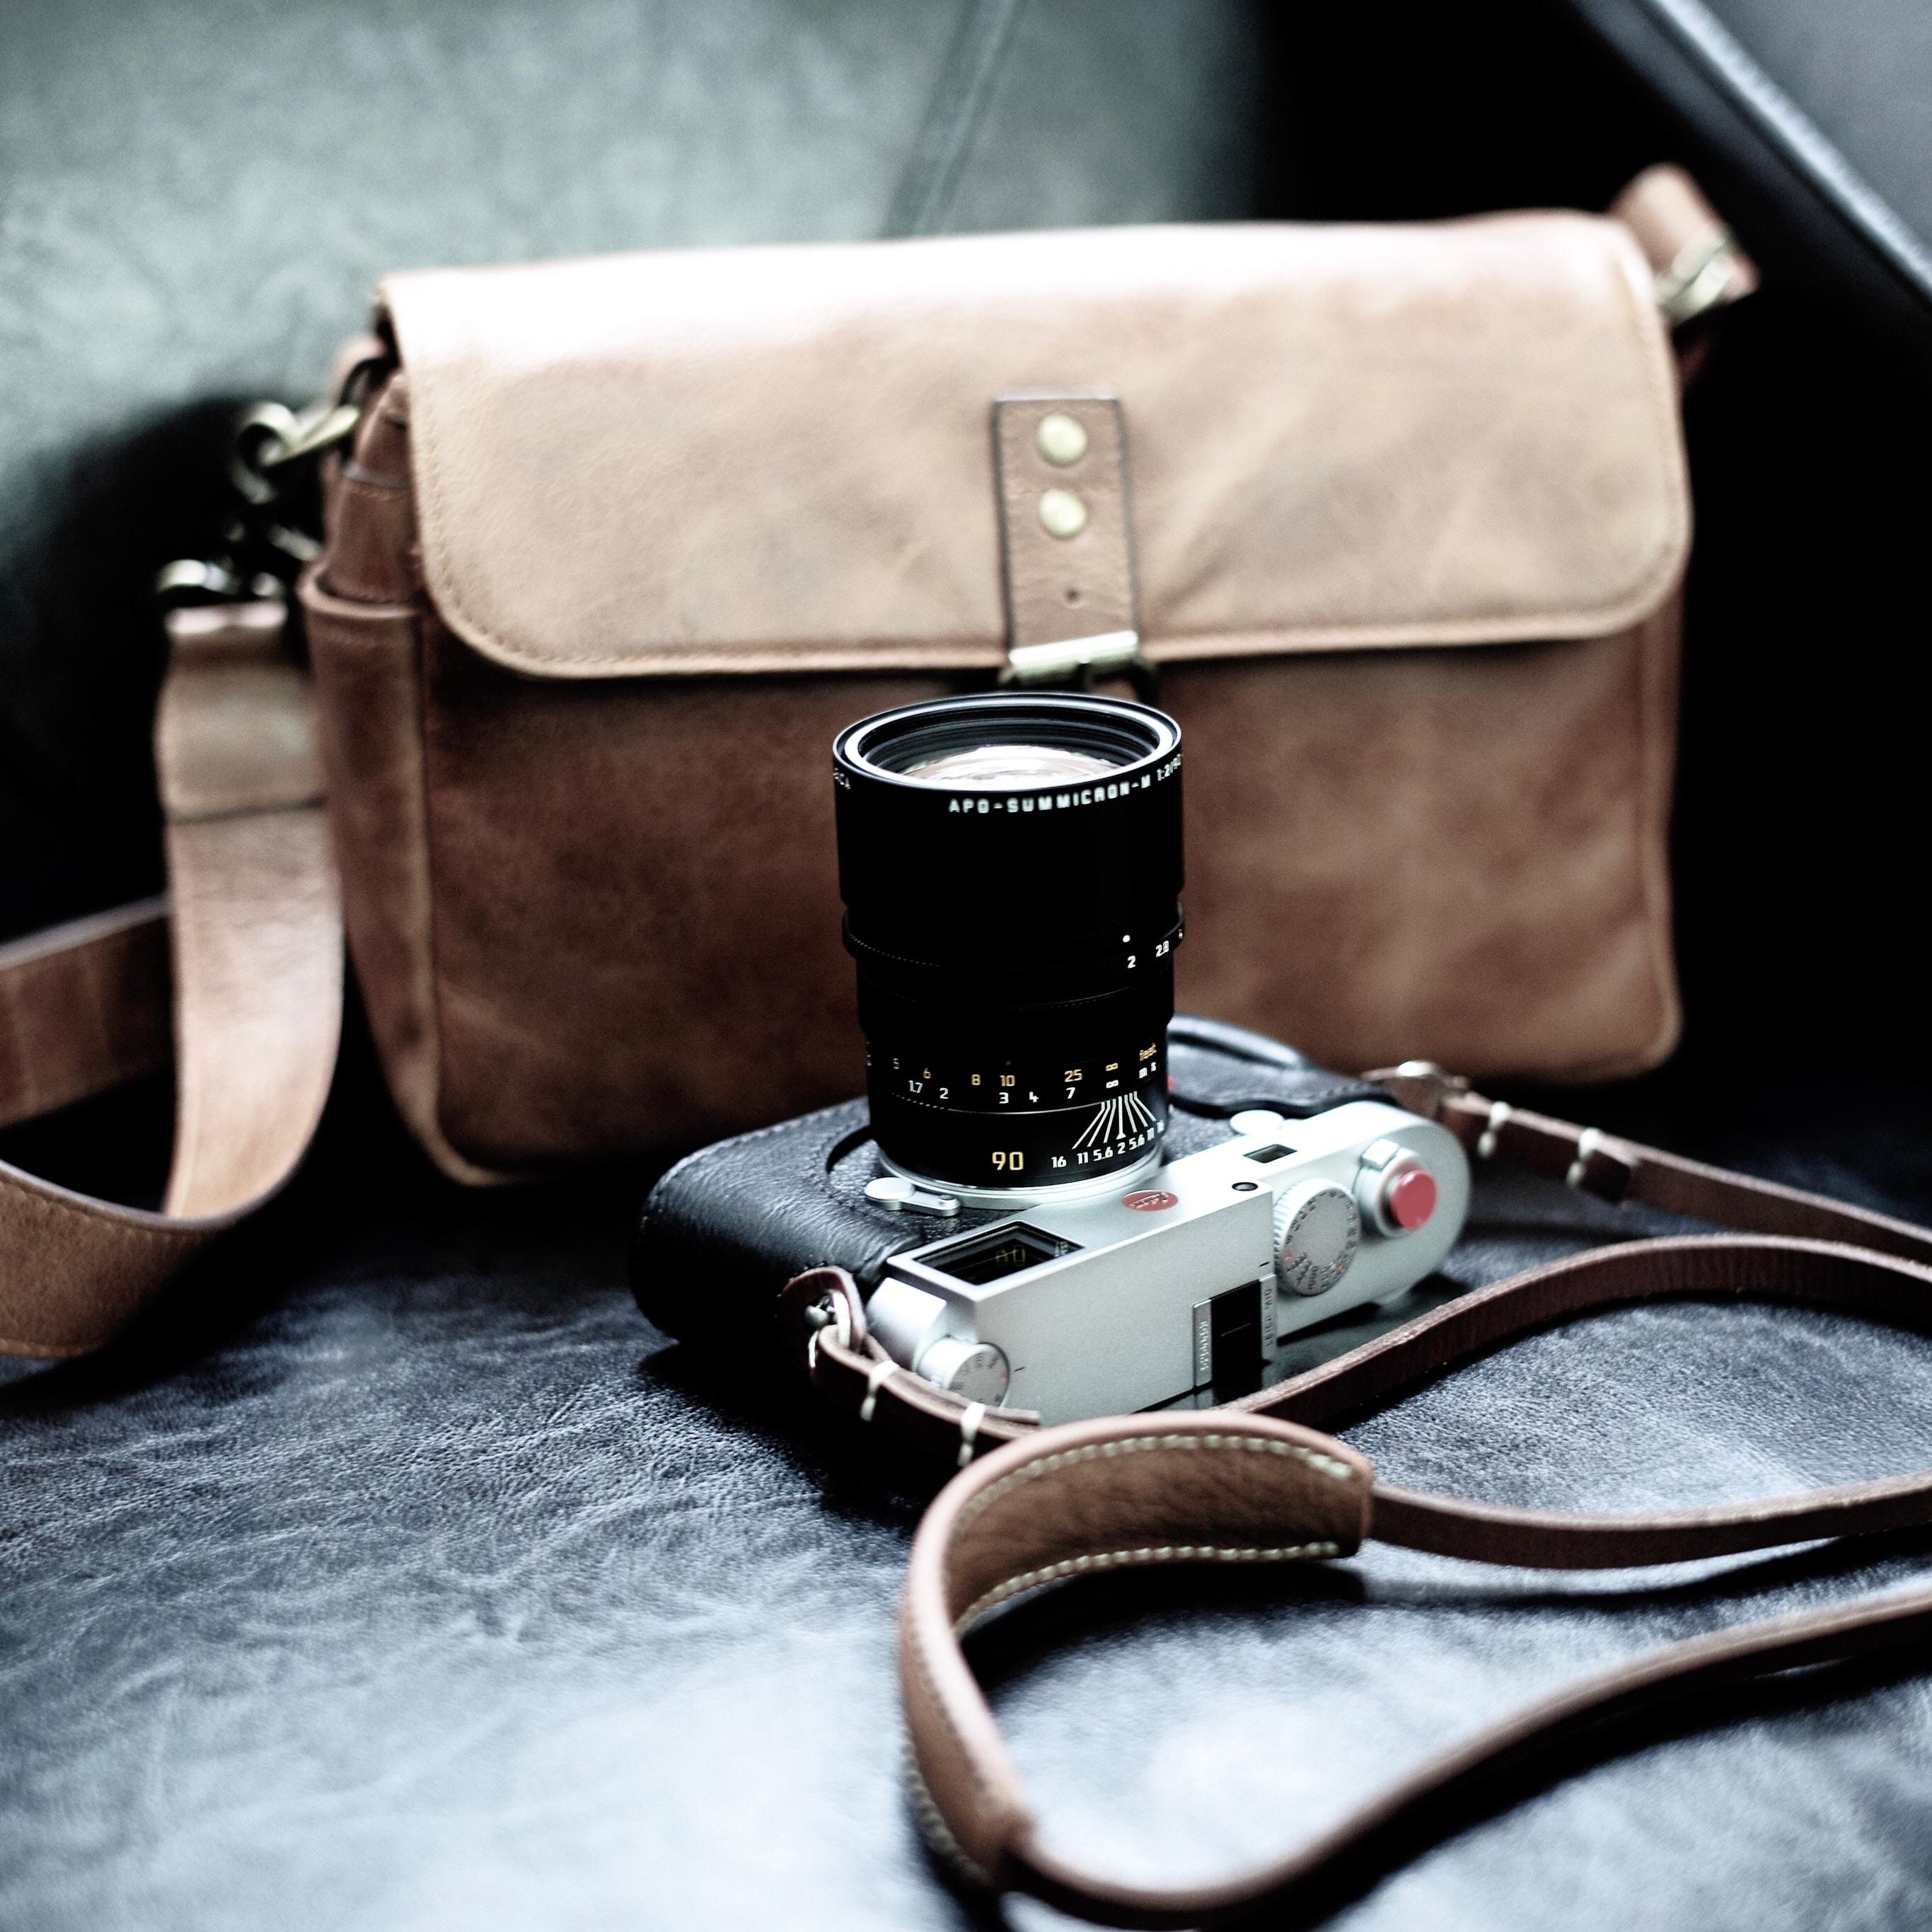 gray and black DSLR camera beside brown leather sling bag